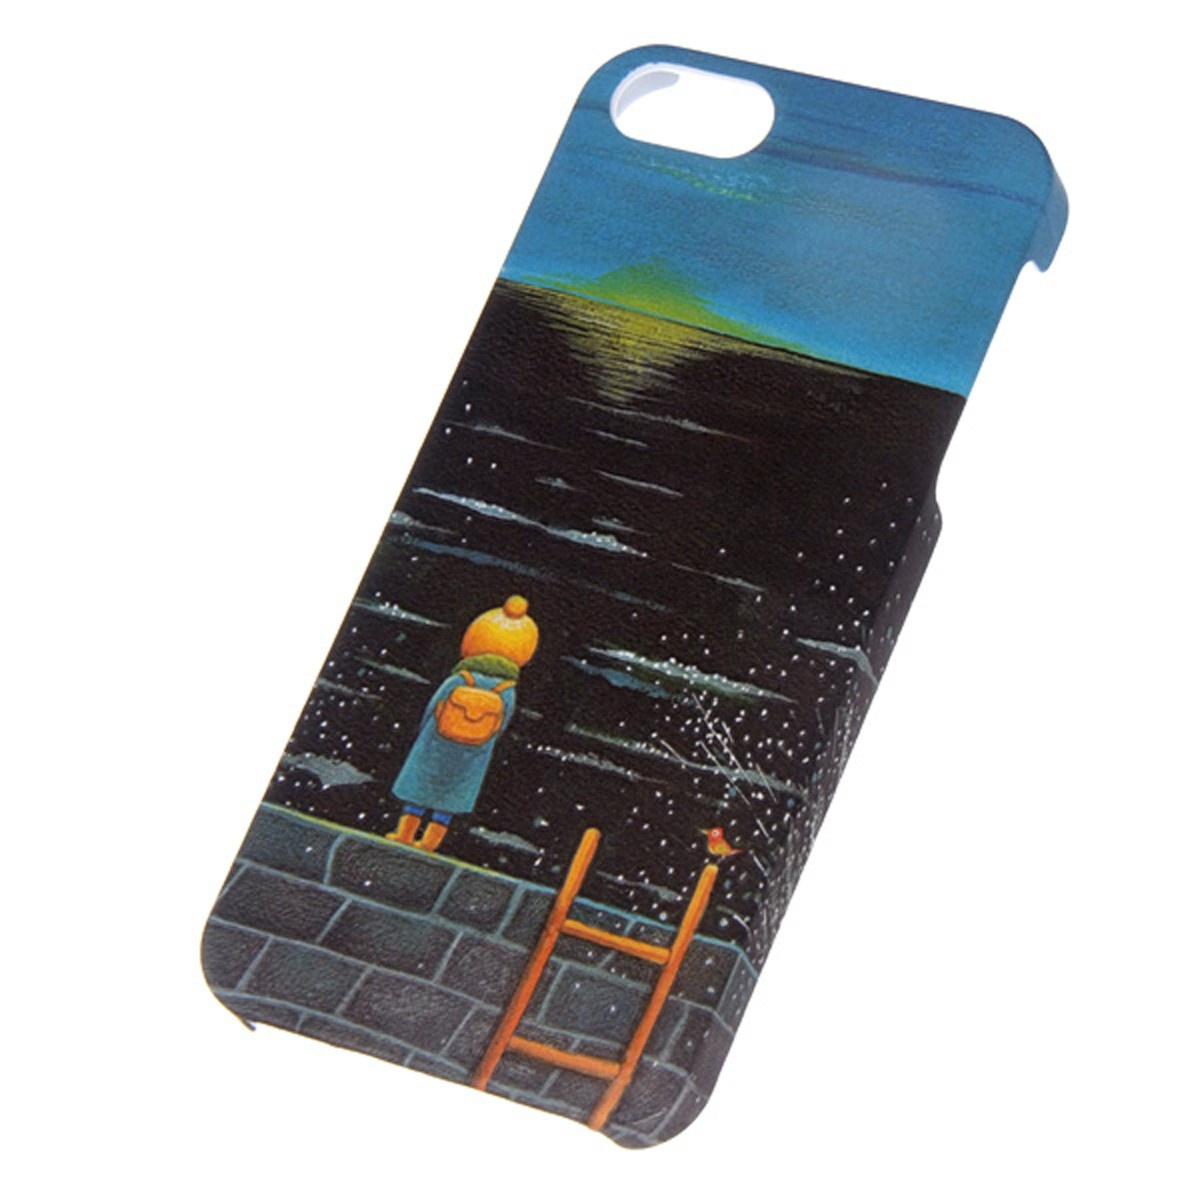 Чехол Mitya Veselkov KAFKA для IPhone 5, KAFKAFIVE-21, серый, черный, синий цена и фото